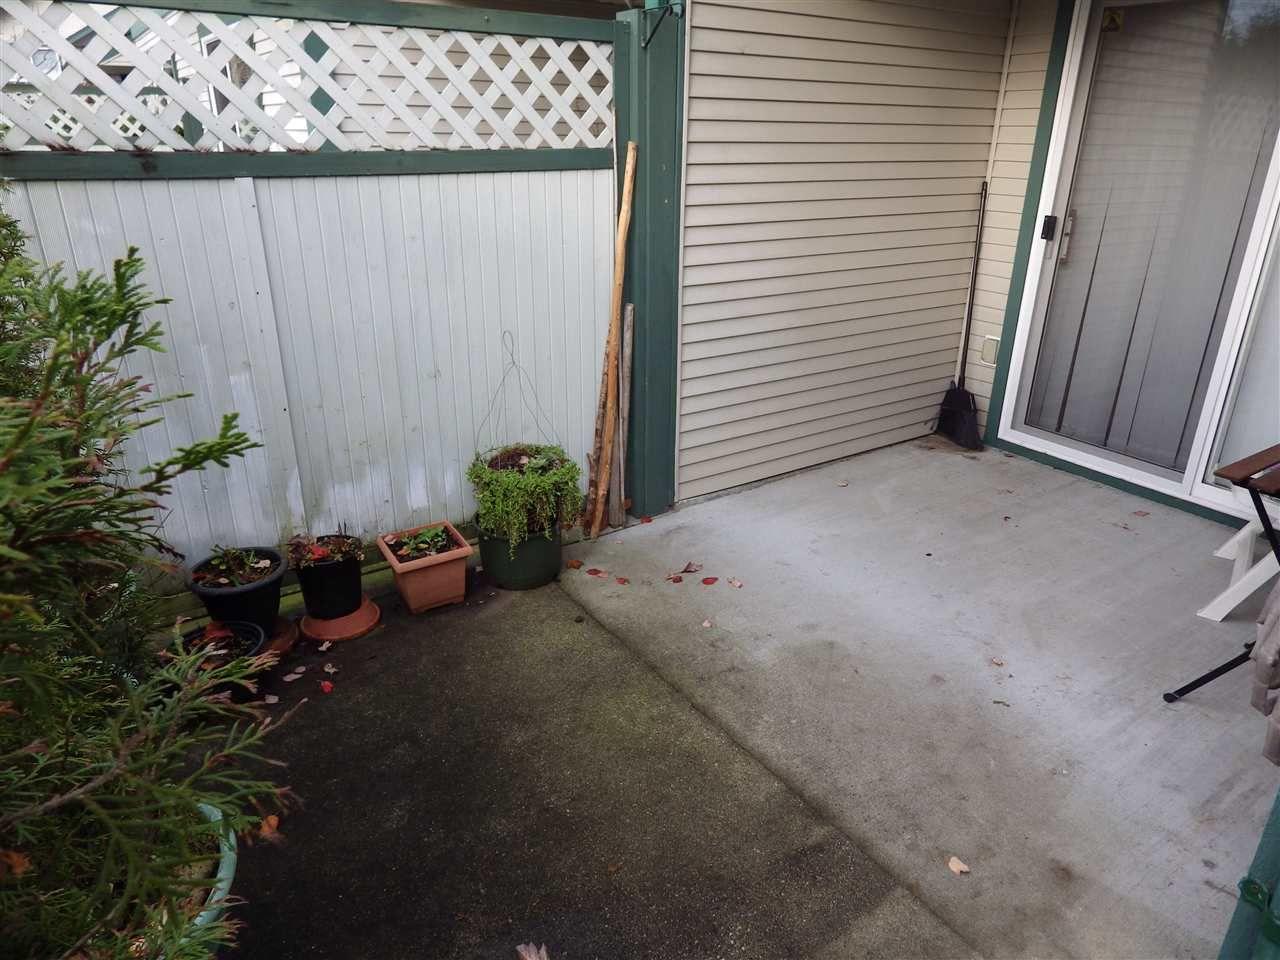 Photo 10: Photos: 102 5711 EBBTIDE Street in Sechelt: Sechelt District Townhouse for sale (Sunshine Coast)  : MLS®# R2122555